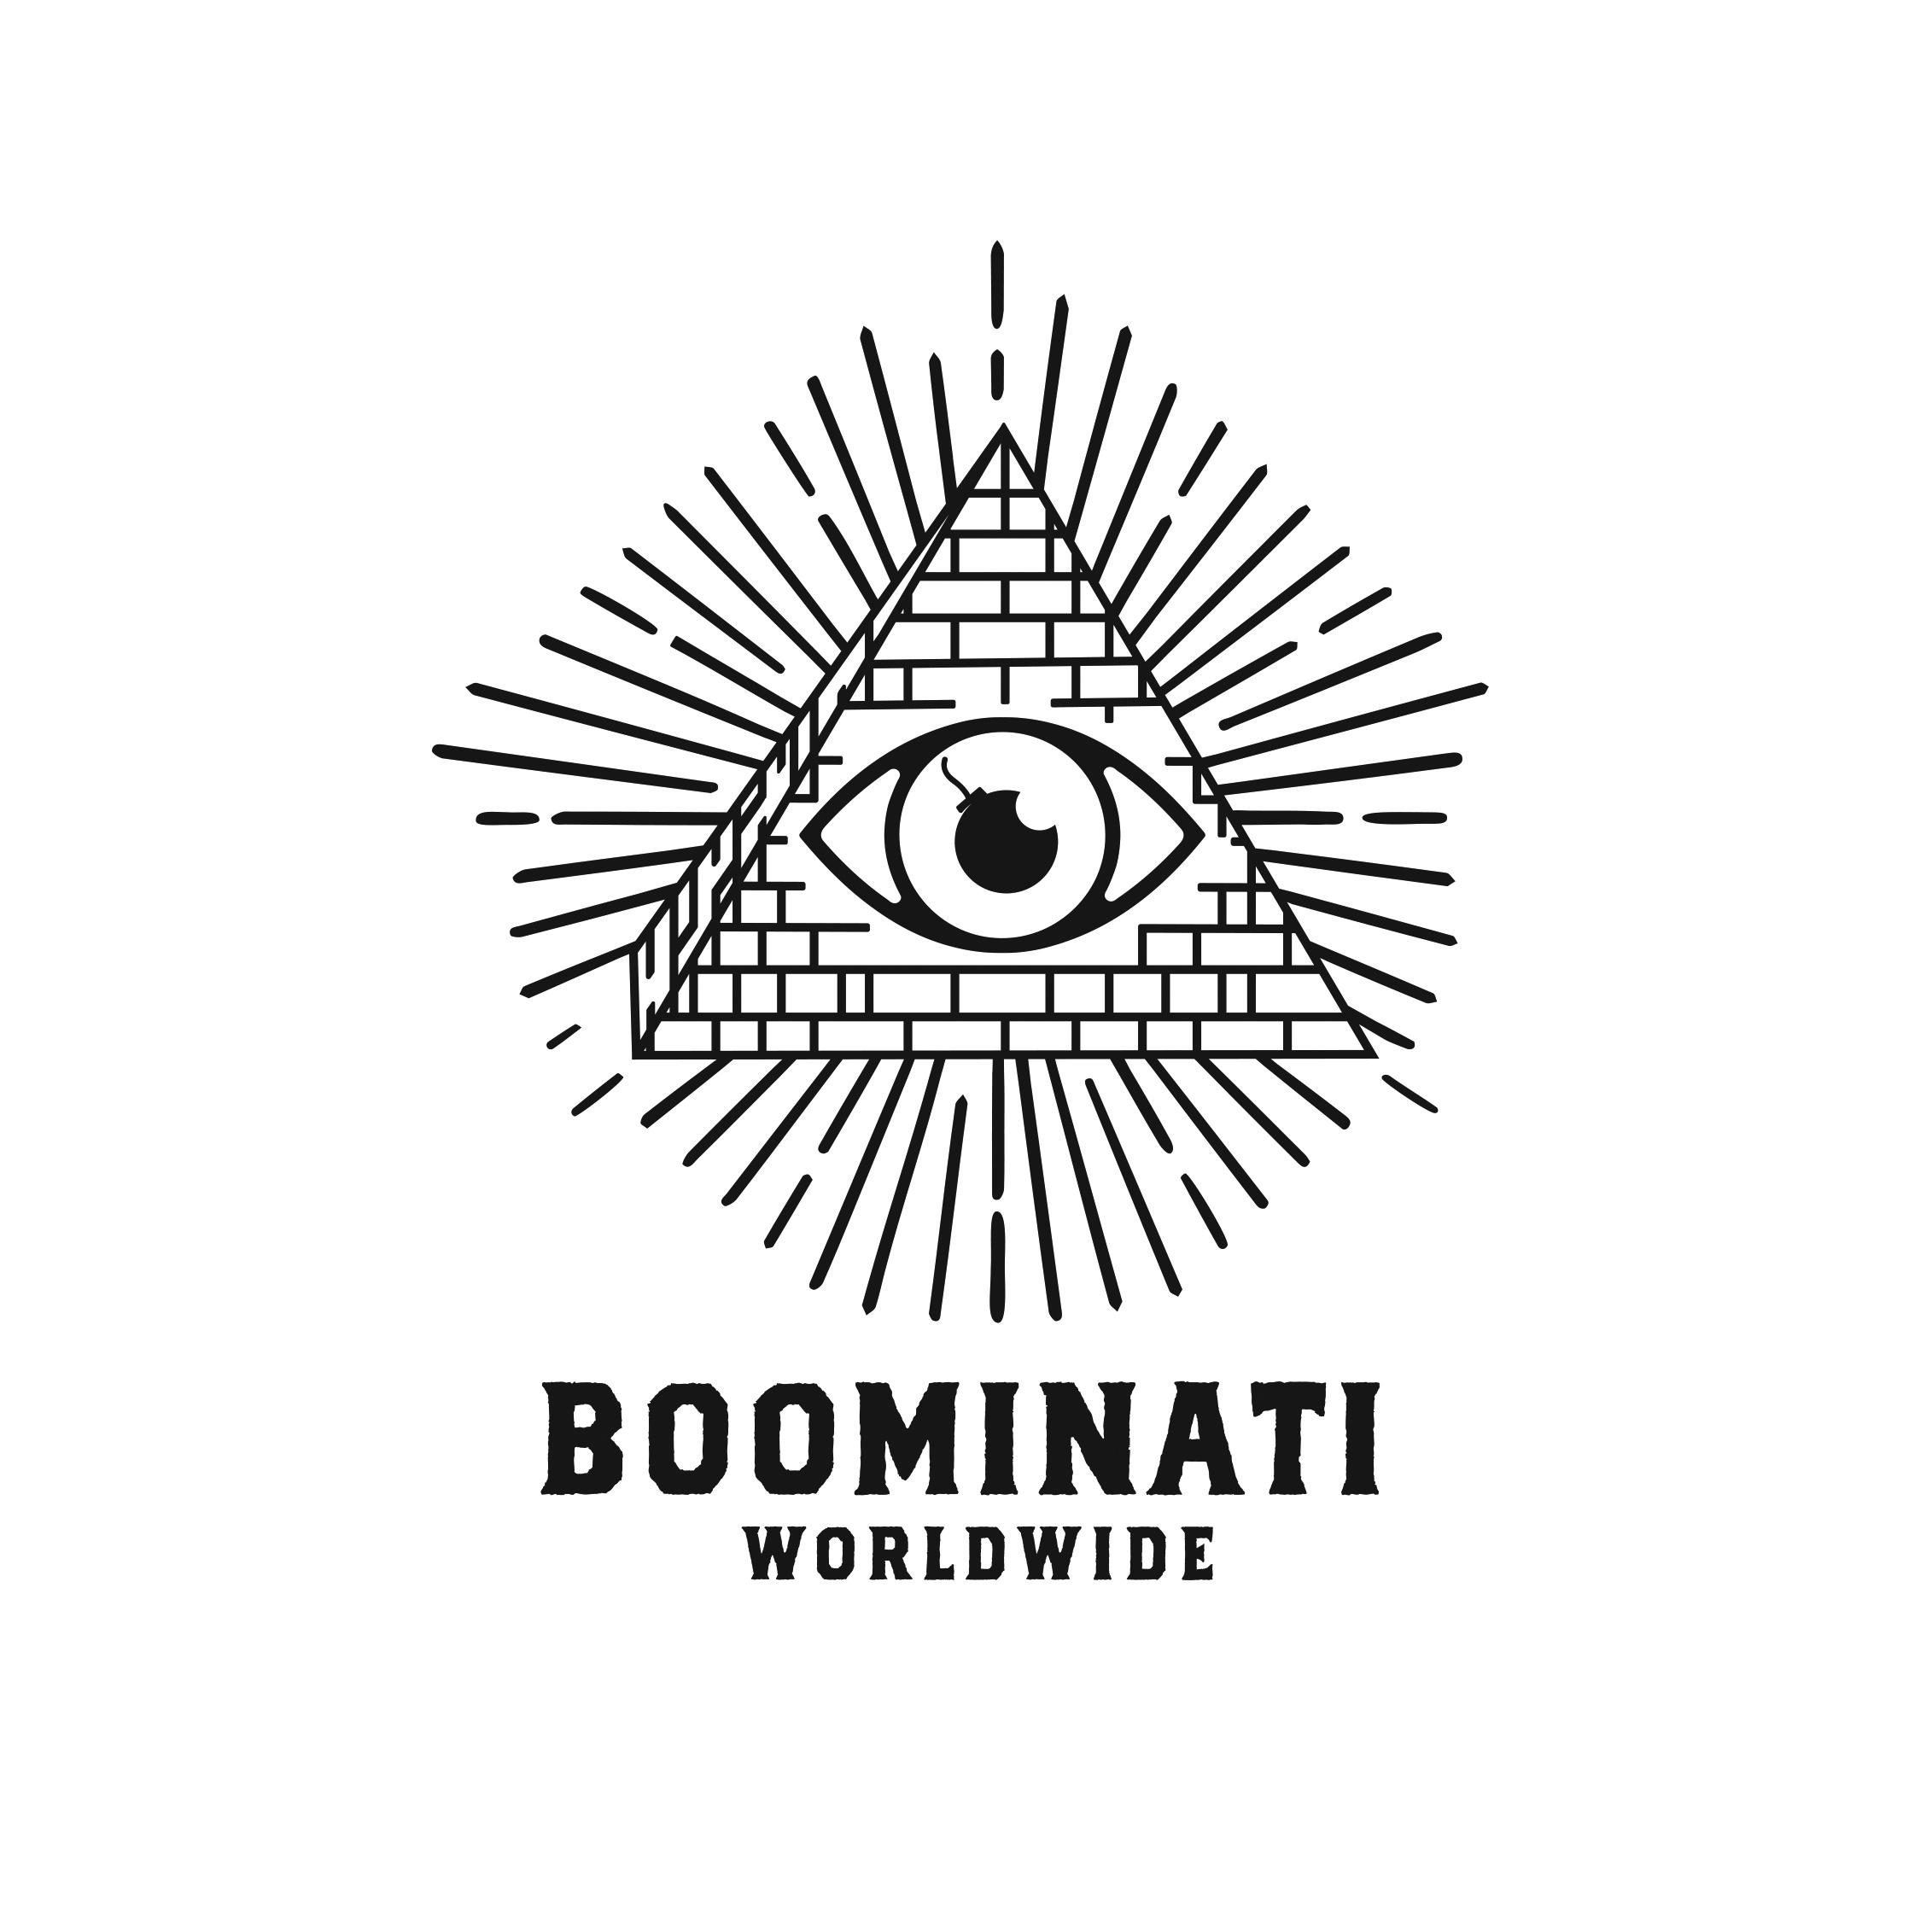 Metro Boomin Announces Boominati Worldwide Label; Shares